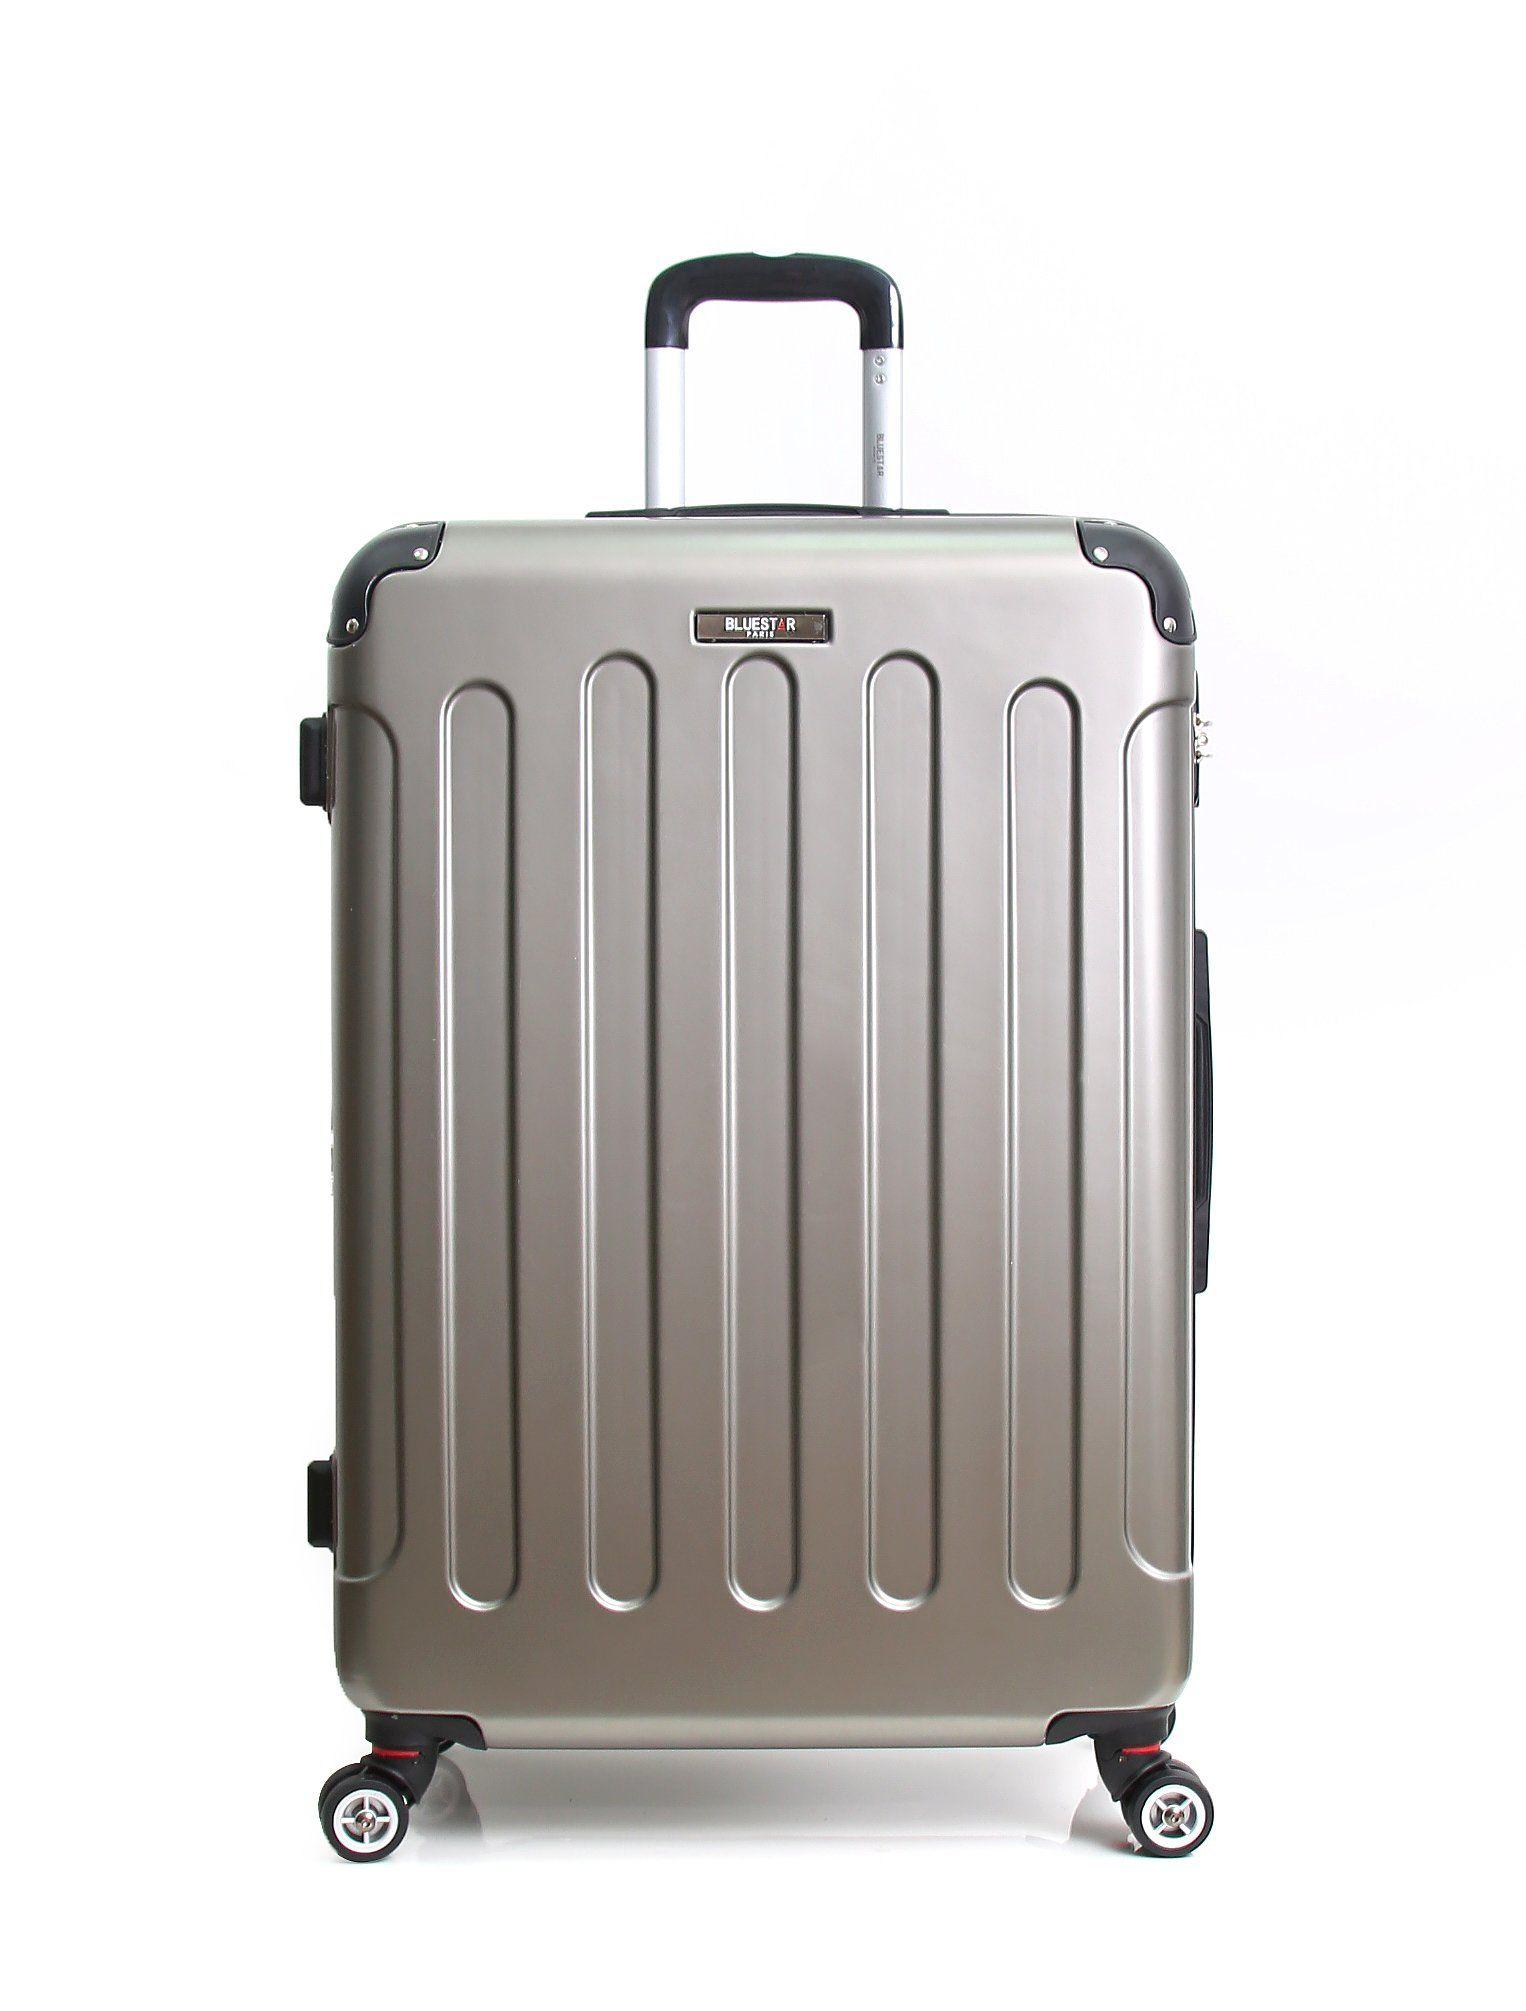 d4f5b46ba0b1 Blue Star Tunis Suitcase, 67 cm, 86 liters, Beige (Champagne) 1 Vali ...